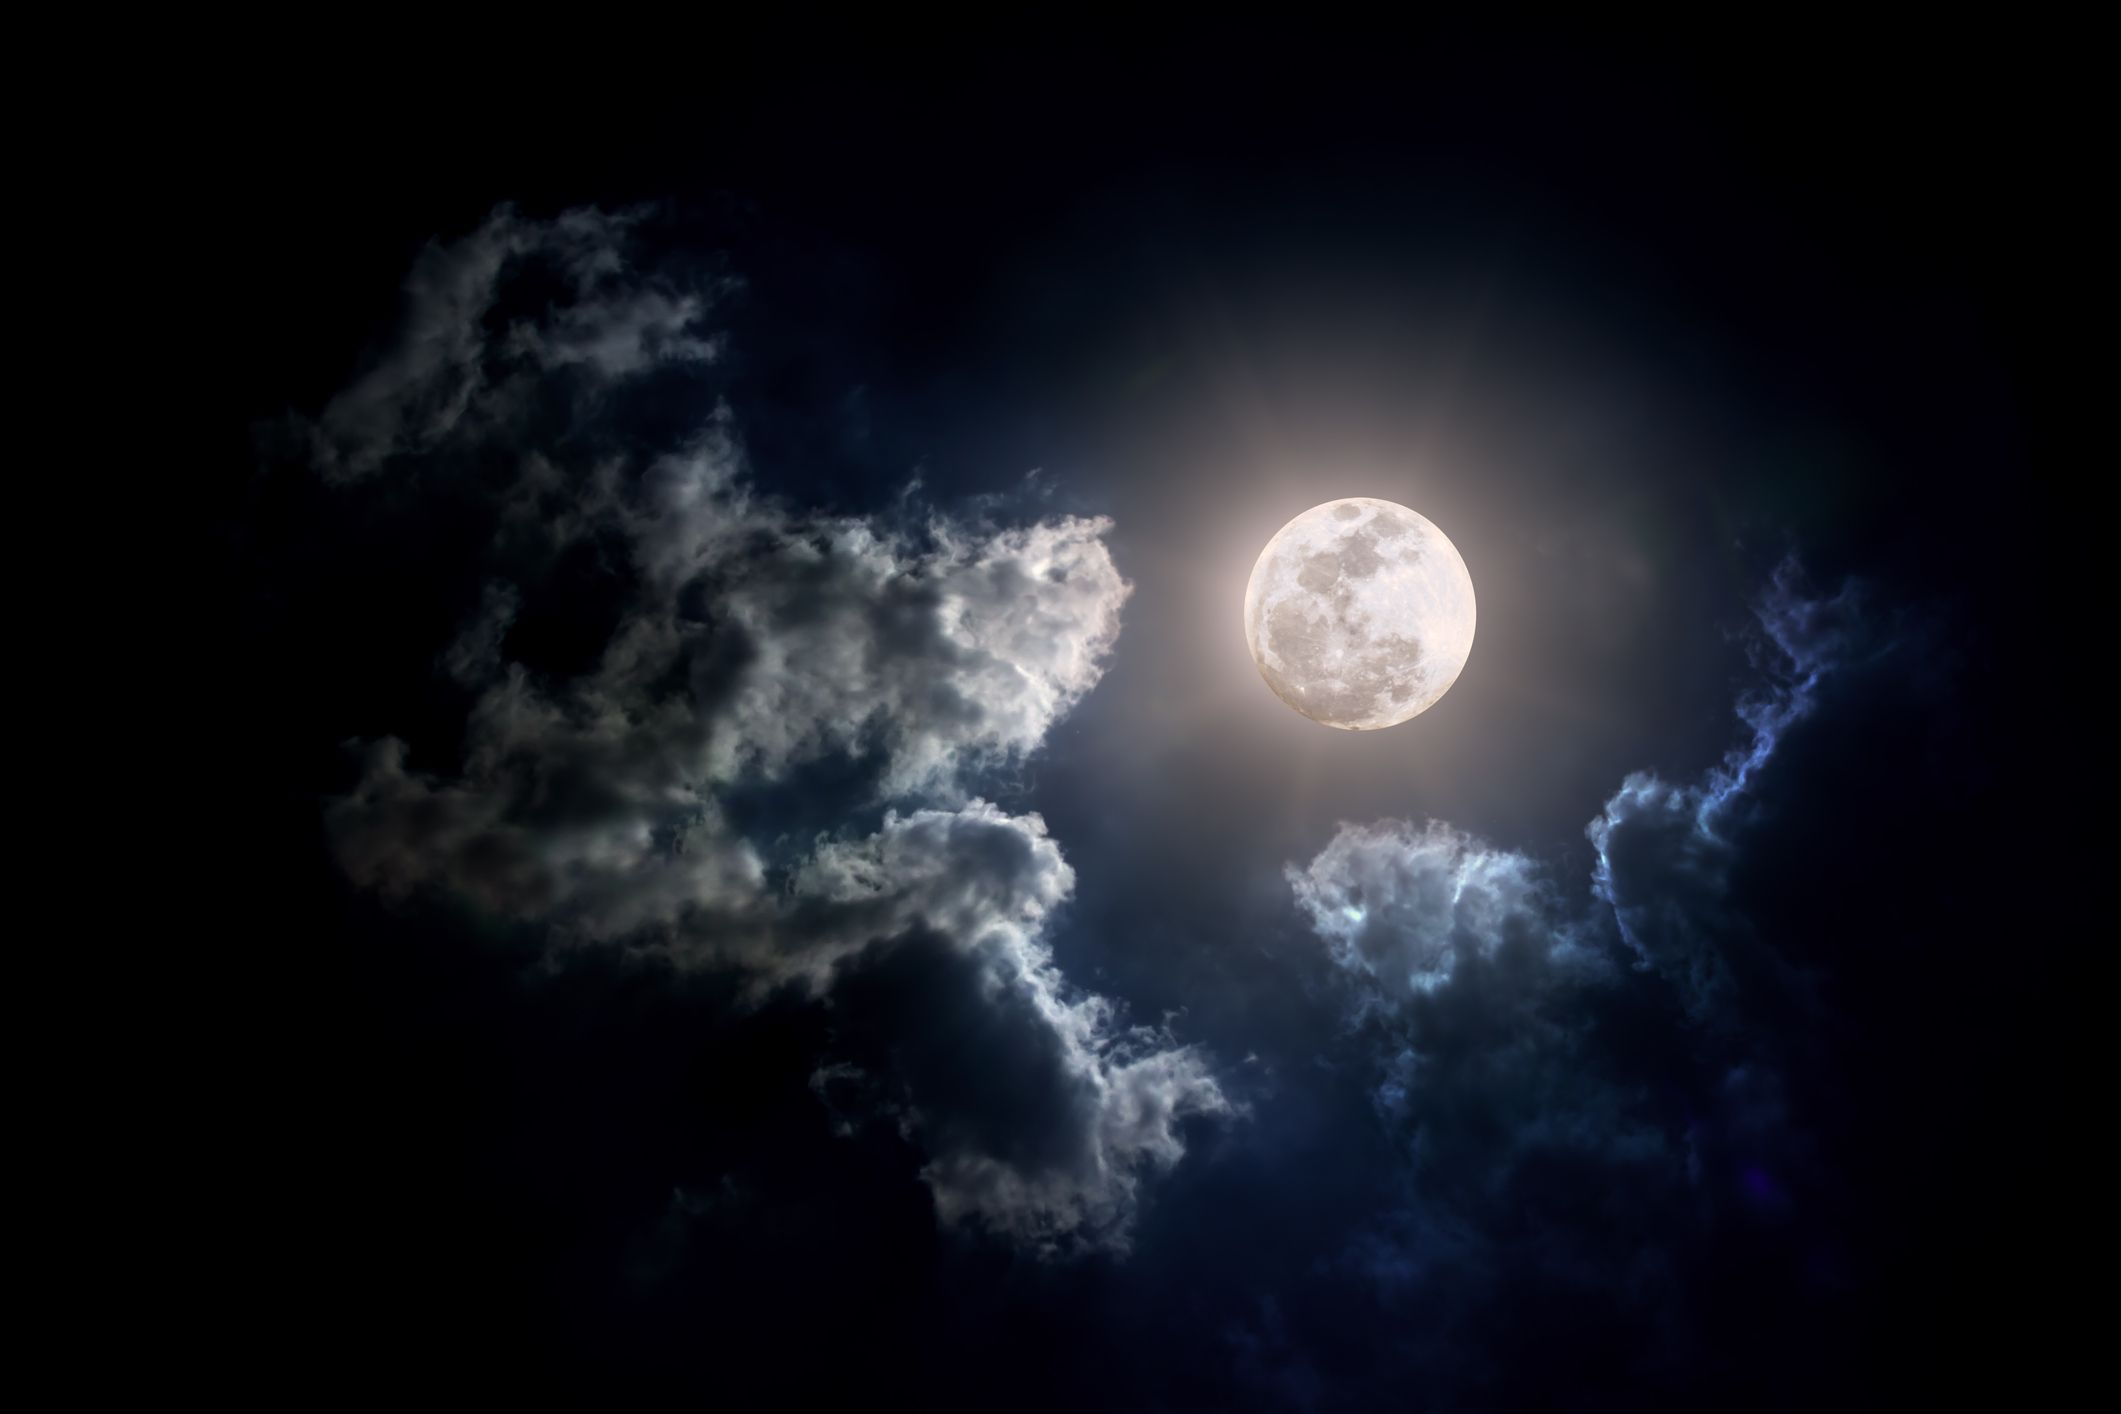 9_24_Full moon